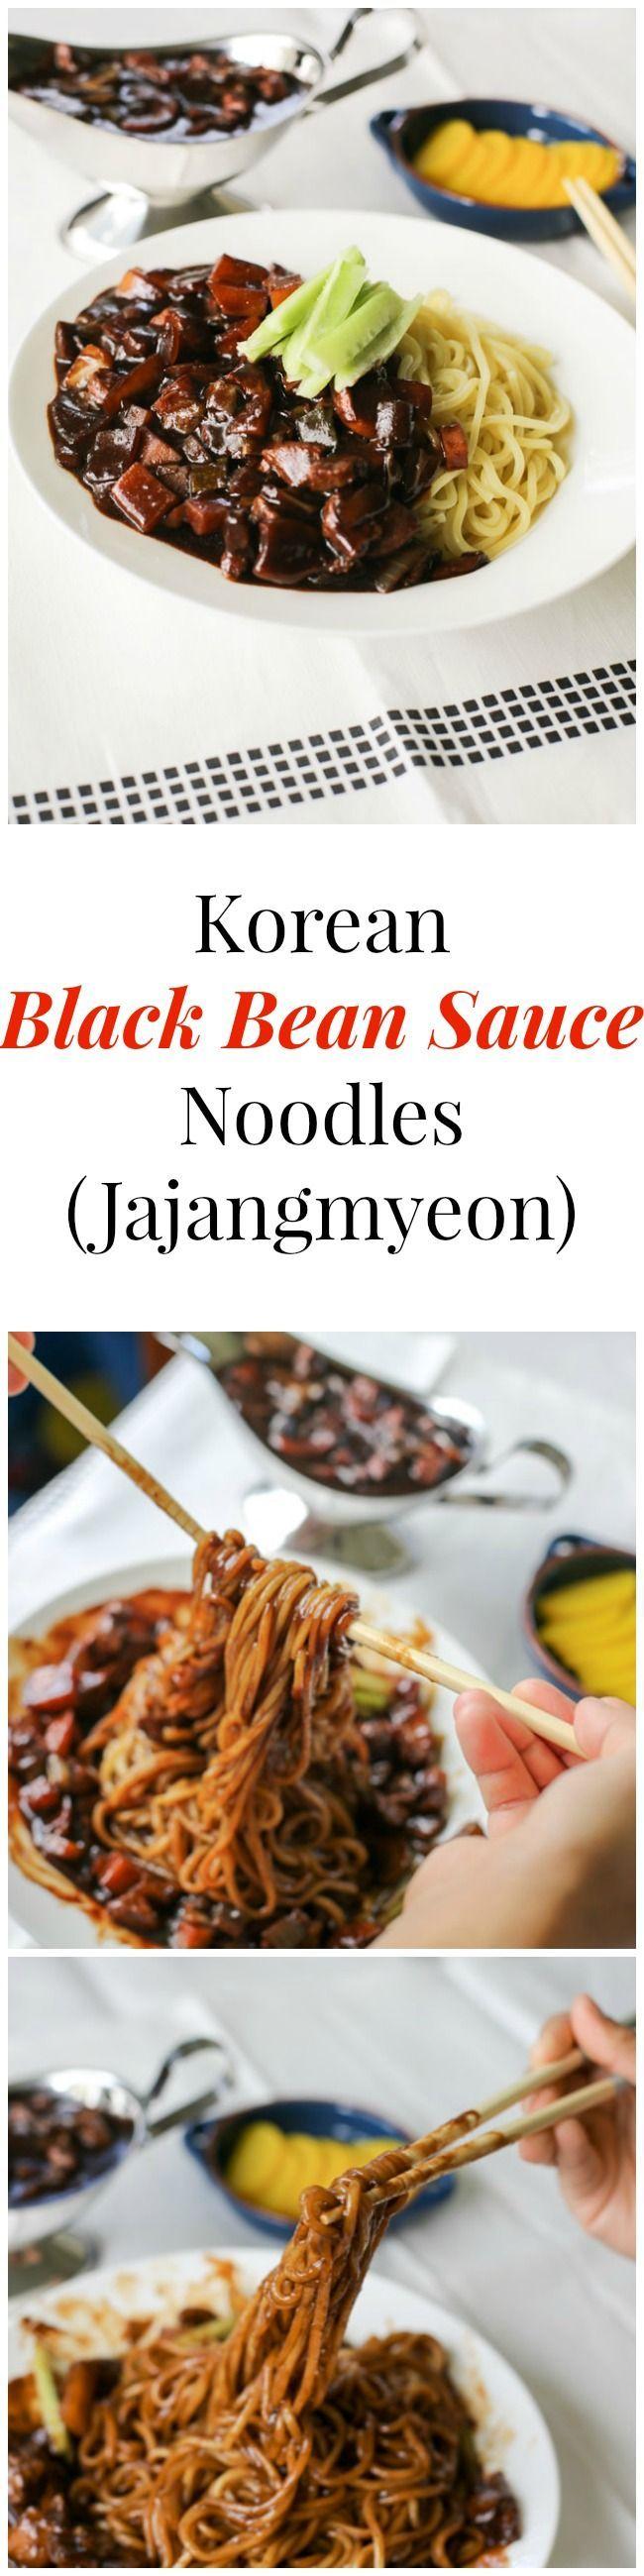 Korean Black Bean Sauce Noodles (Jajangmyeon)   MyKoreanKitchen.com